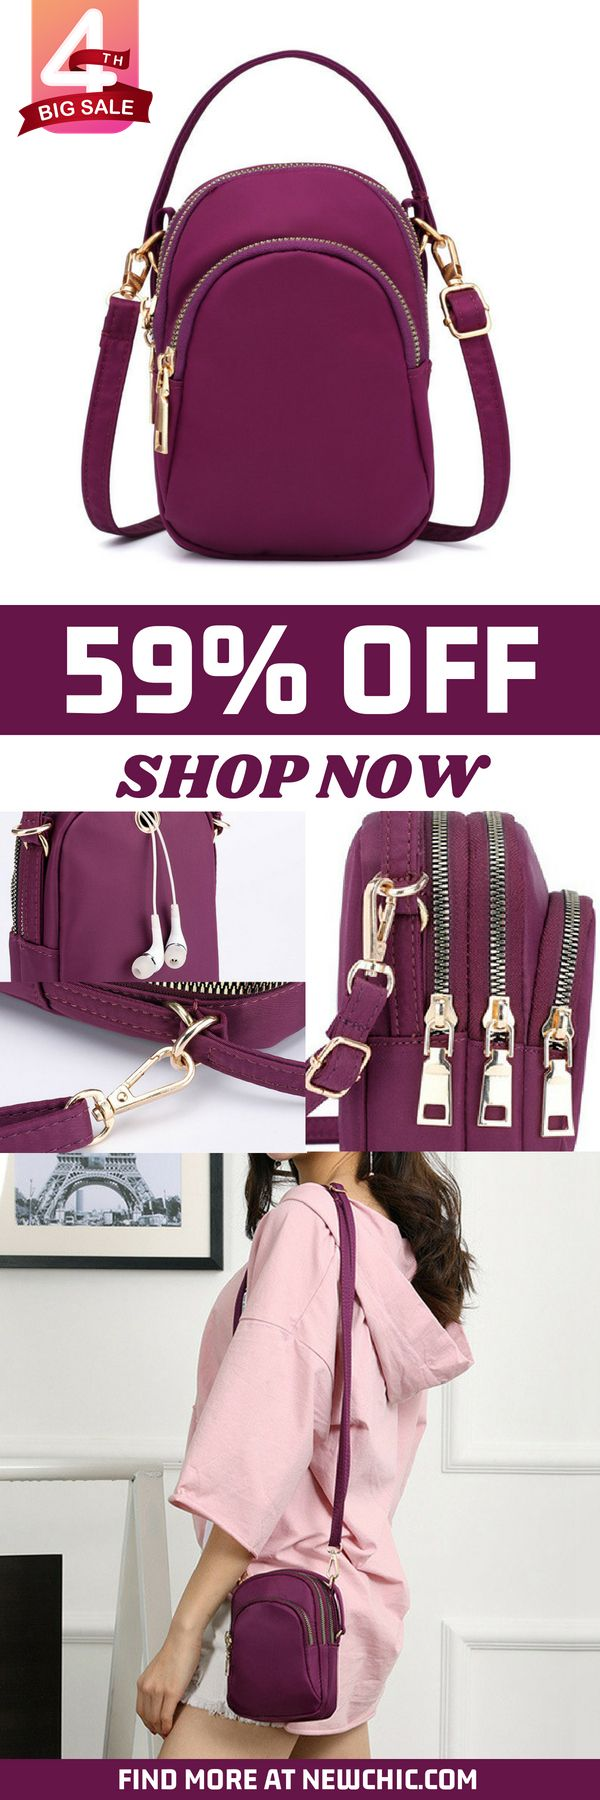 【US$13.59】Women Nylon Waterproof Multi- Slot Solid Crossbody Bag Mini Portable Phone Bag#nylon#waterproof#multi-slot#crossbody#fashion#mini #phonebag